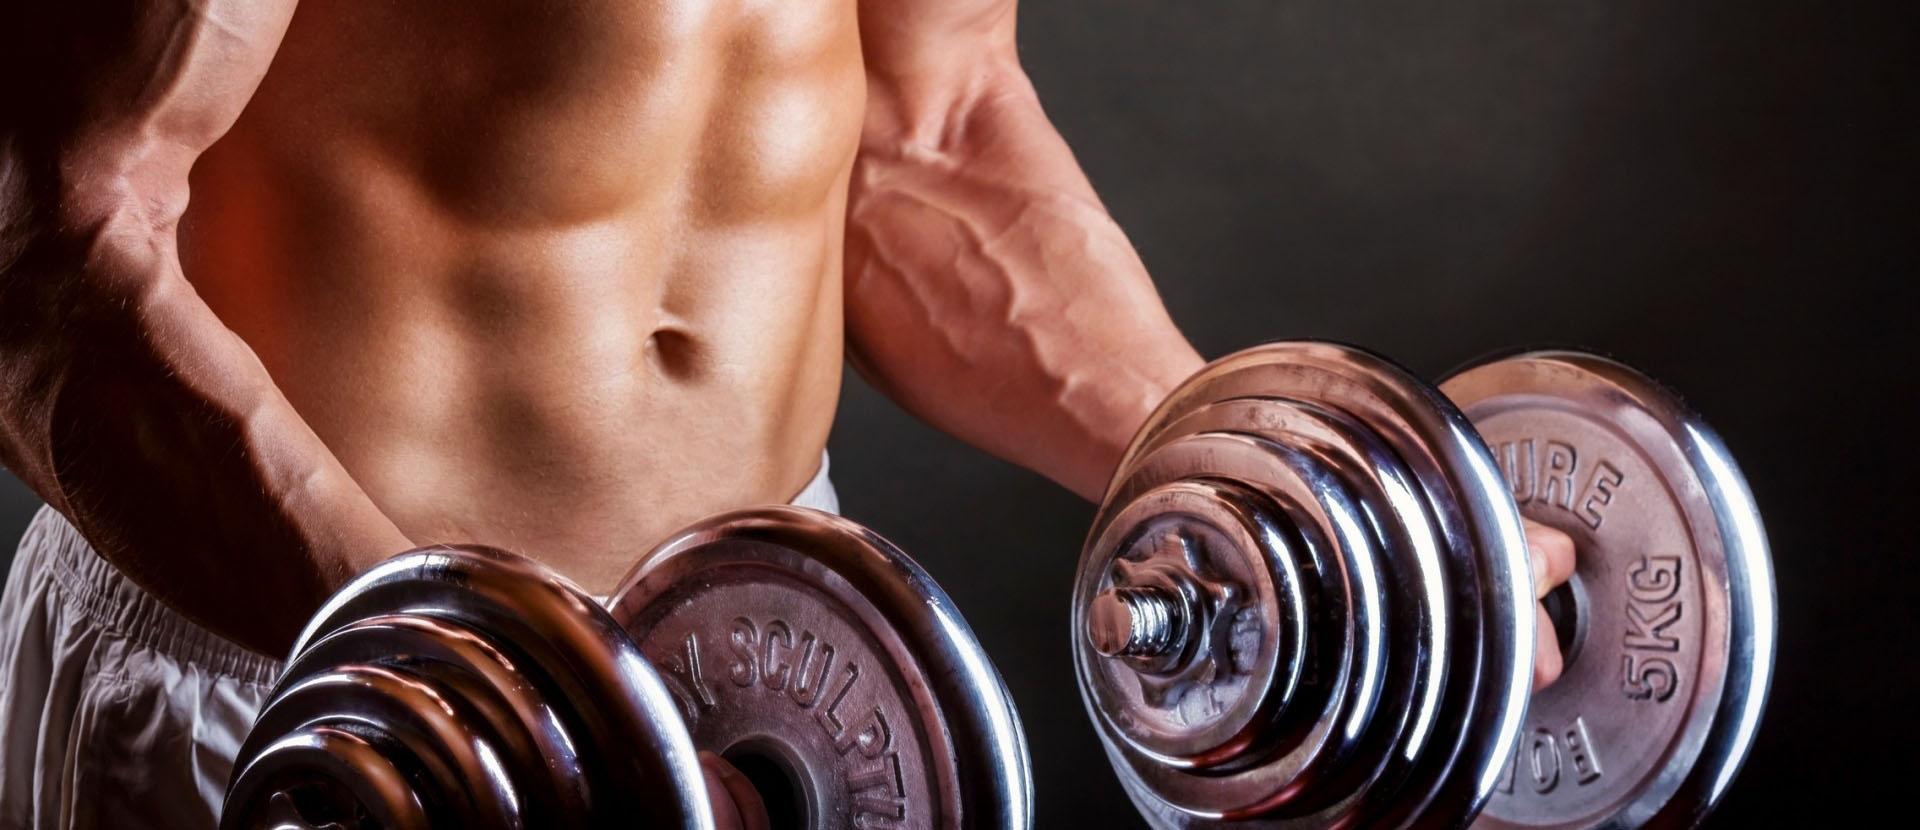 buy steroids australia